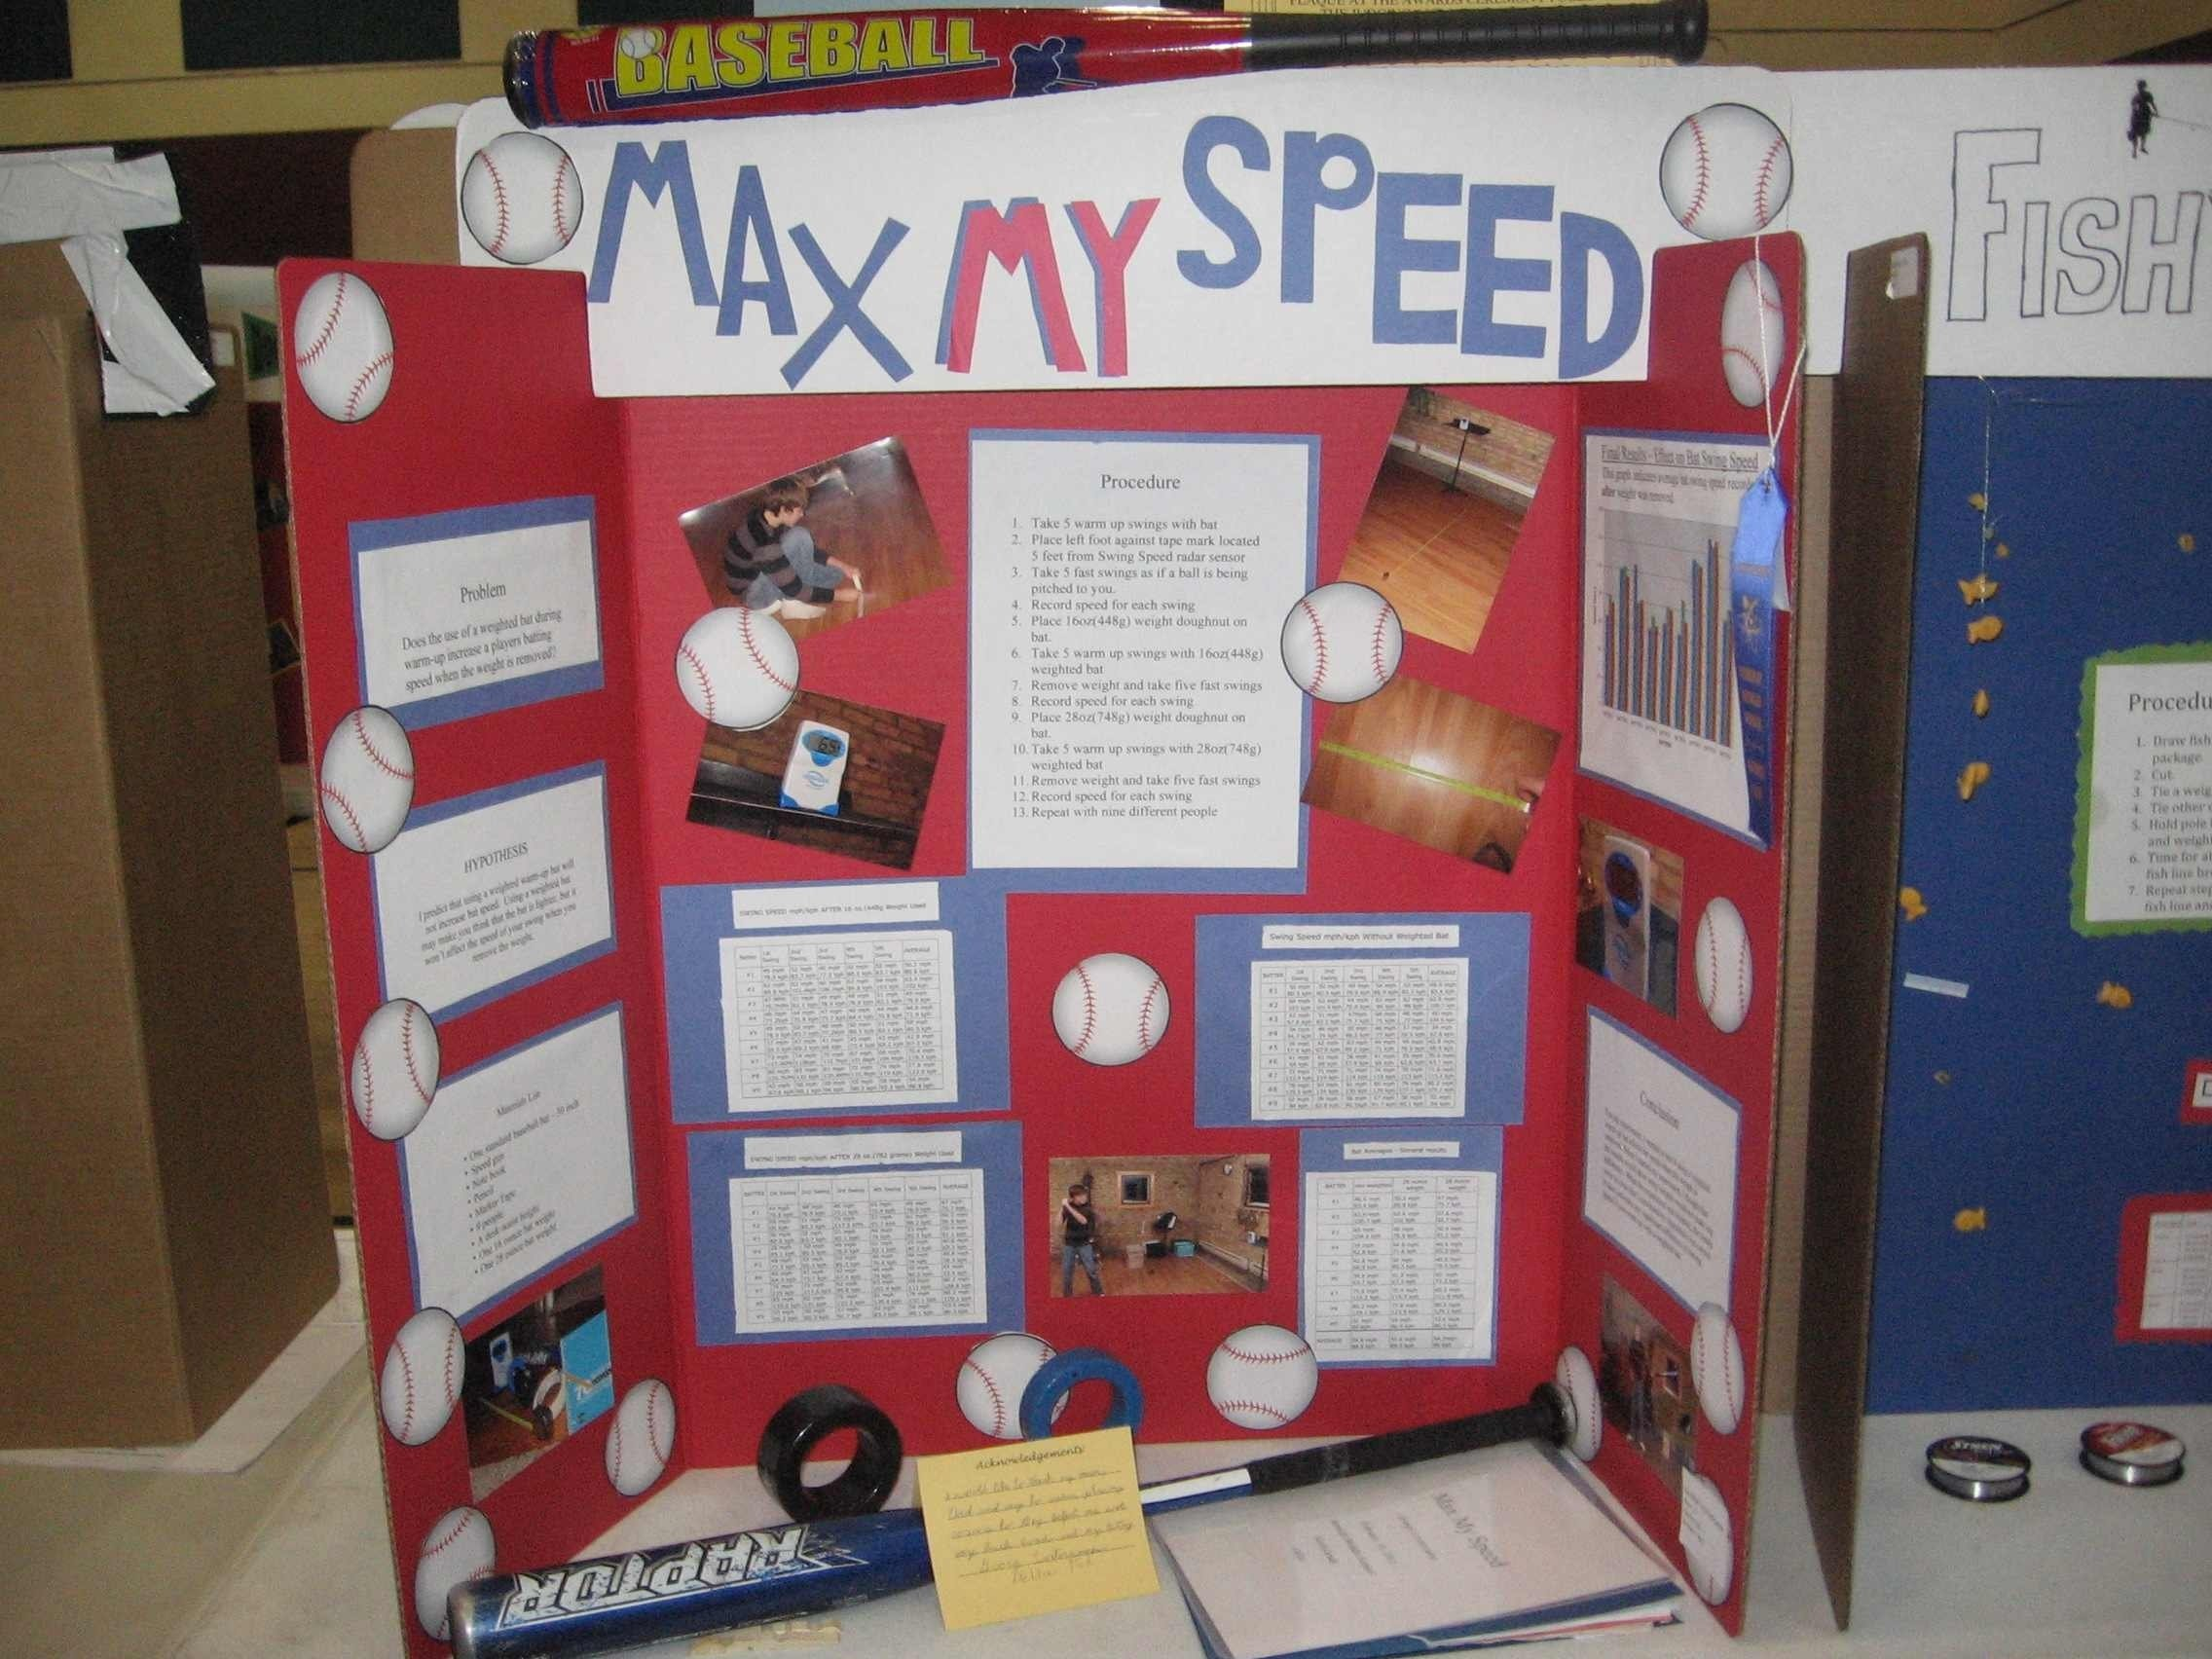 10 Spectacular Good Science Fair Projects Ideas ms bergs delta science bemidji k12 mn 4 2021